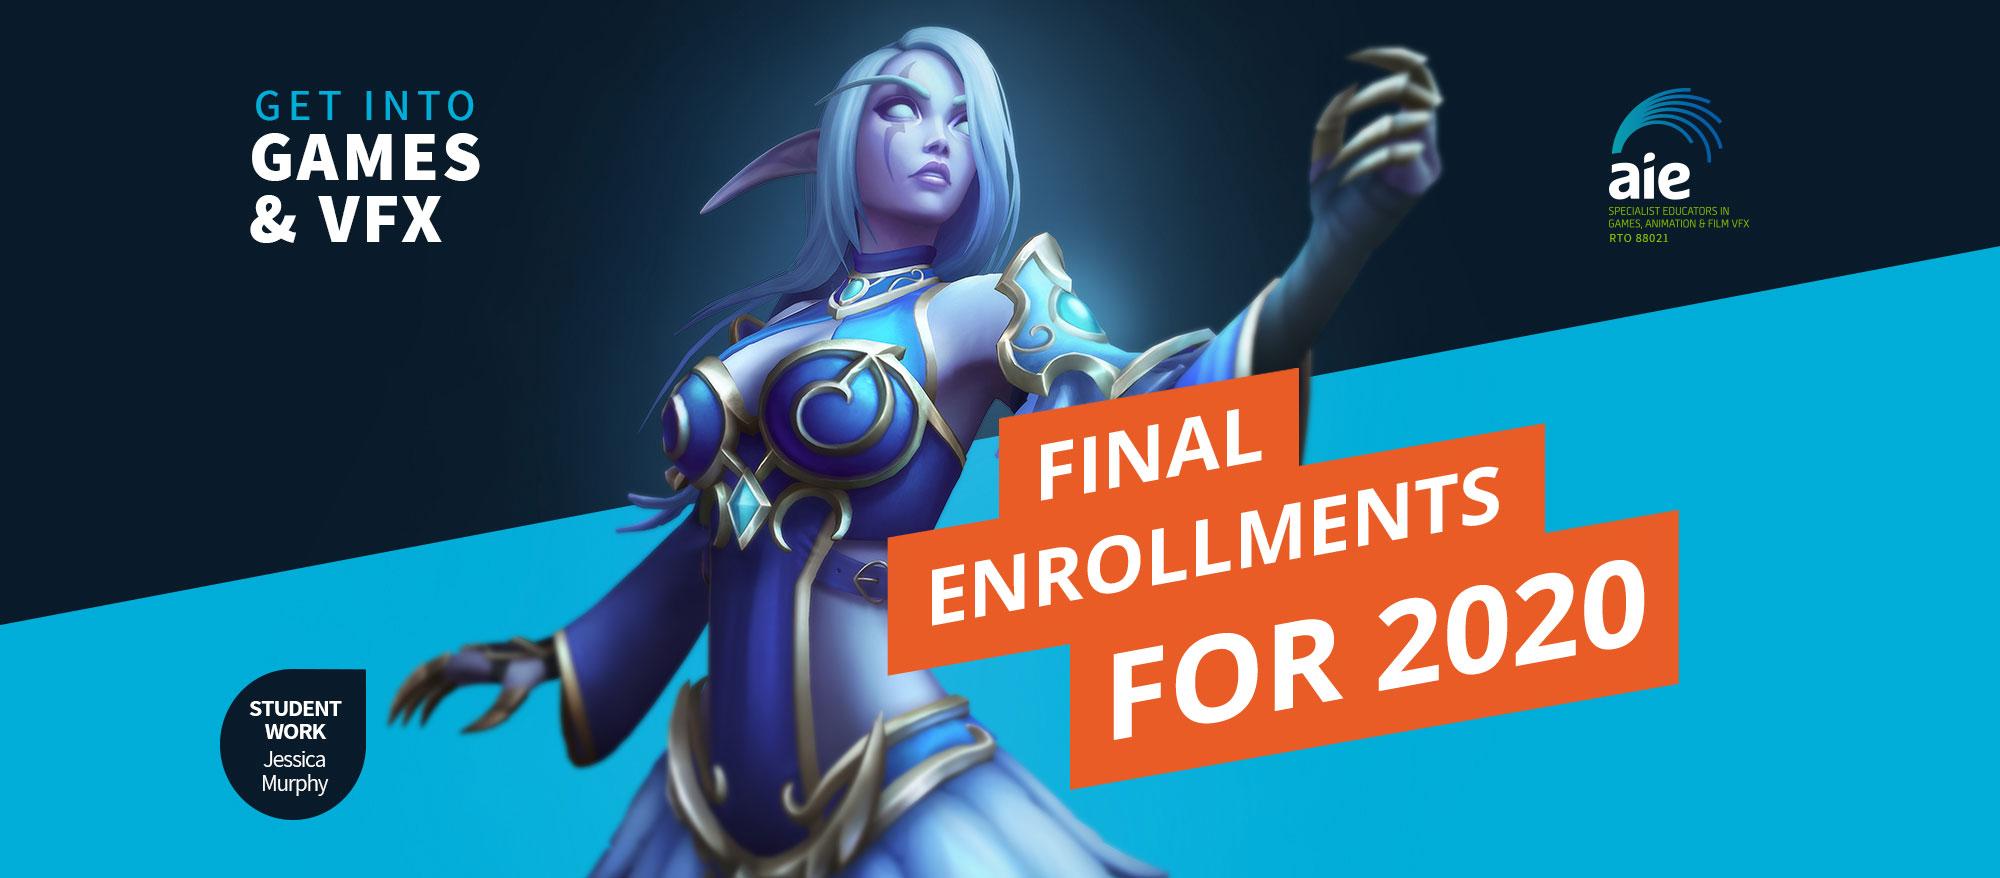 Final Enrolments 2020 Header Image | AIE